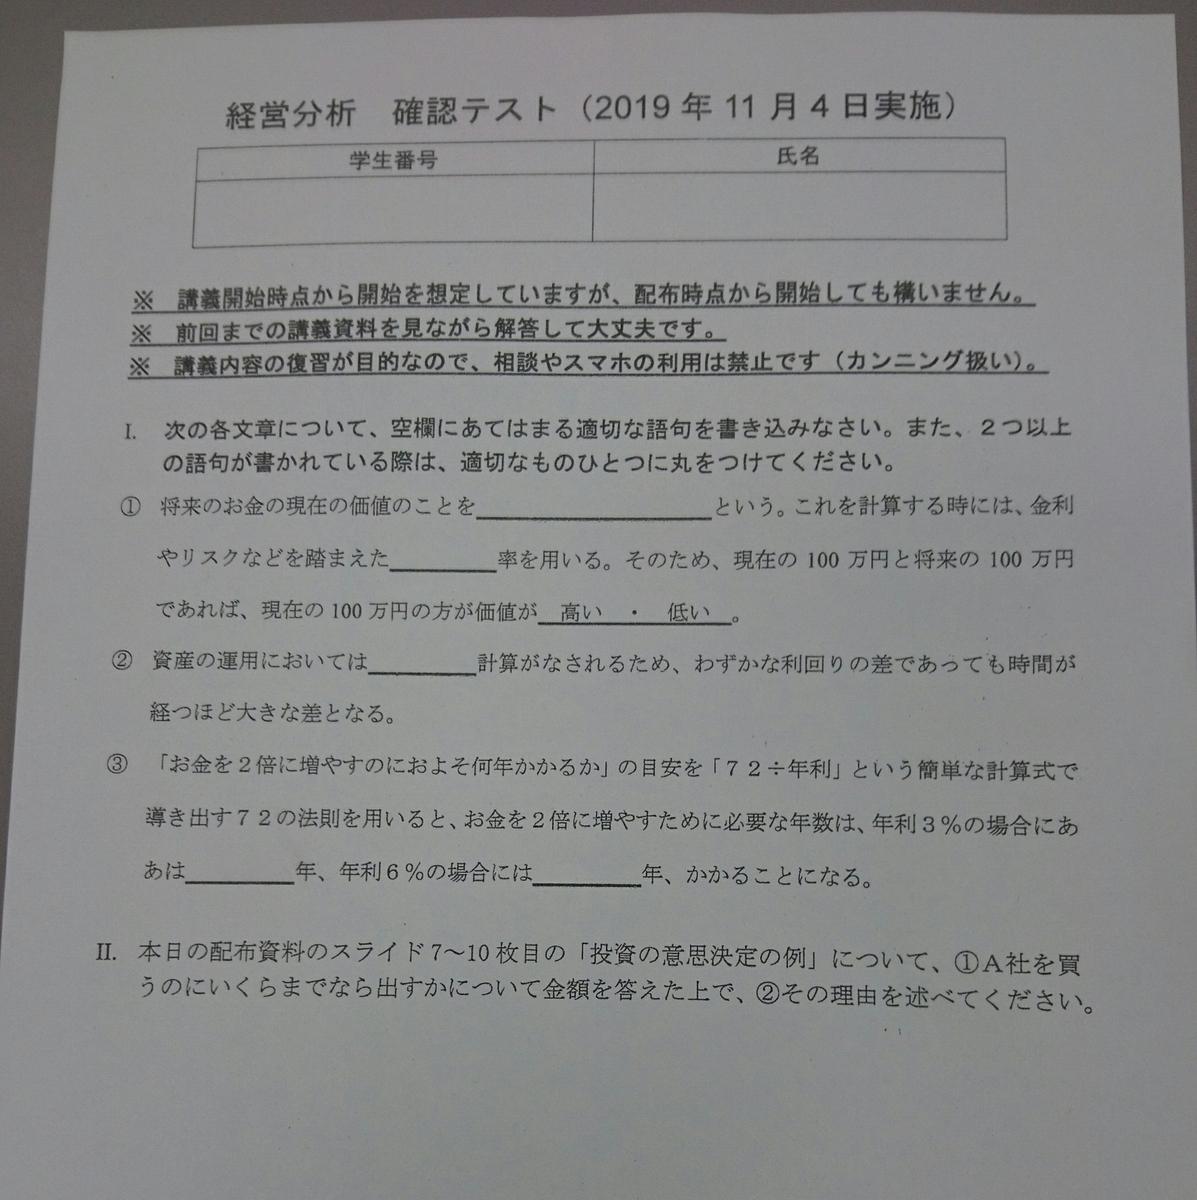 f:id:TakahisaWakabayashi:20191104192110j:plain